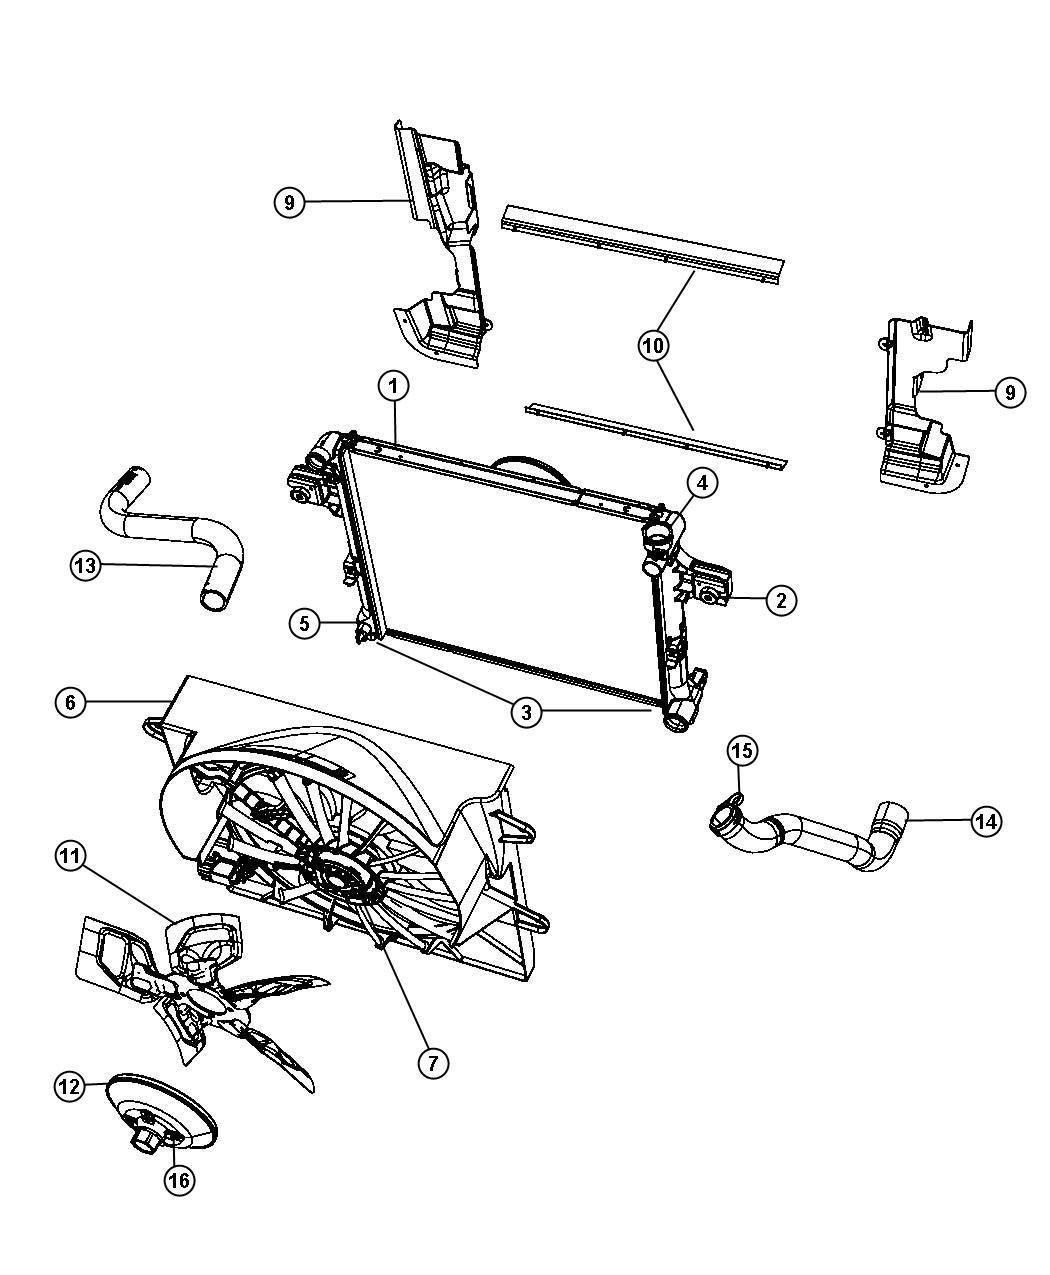 1966 jeep cj5 wiring diagram | wiring diagram database jeep cj wiring  diagram alt on 76